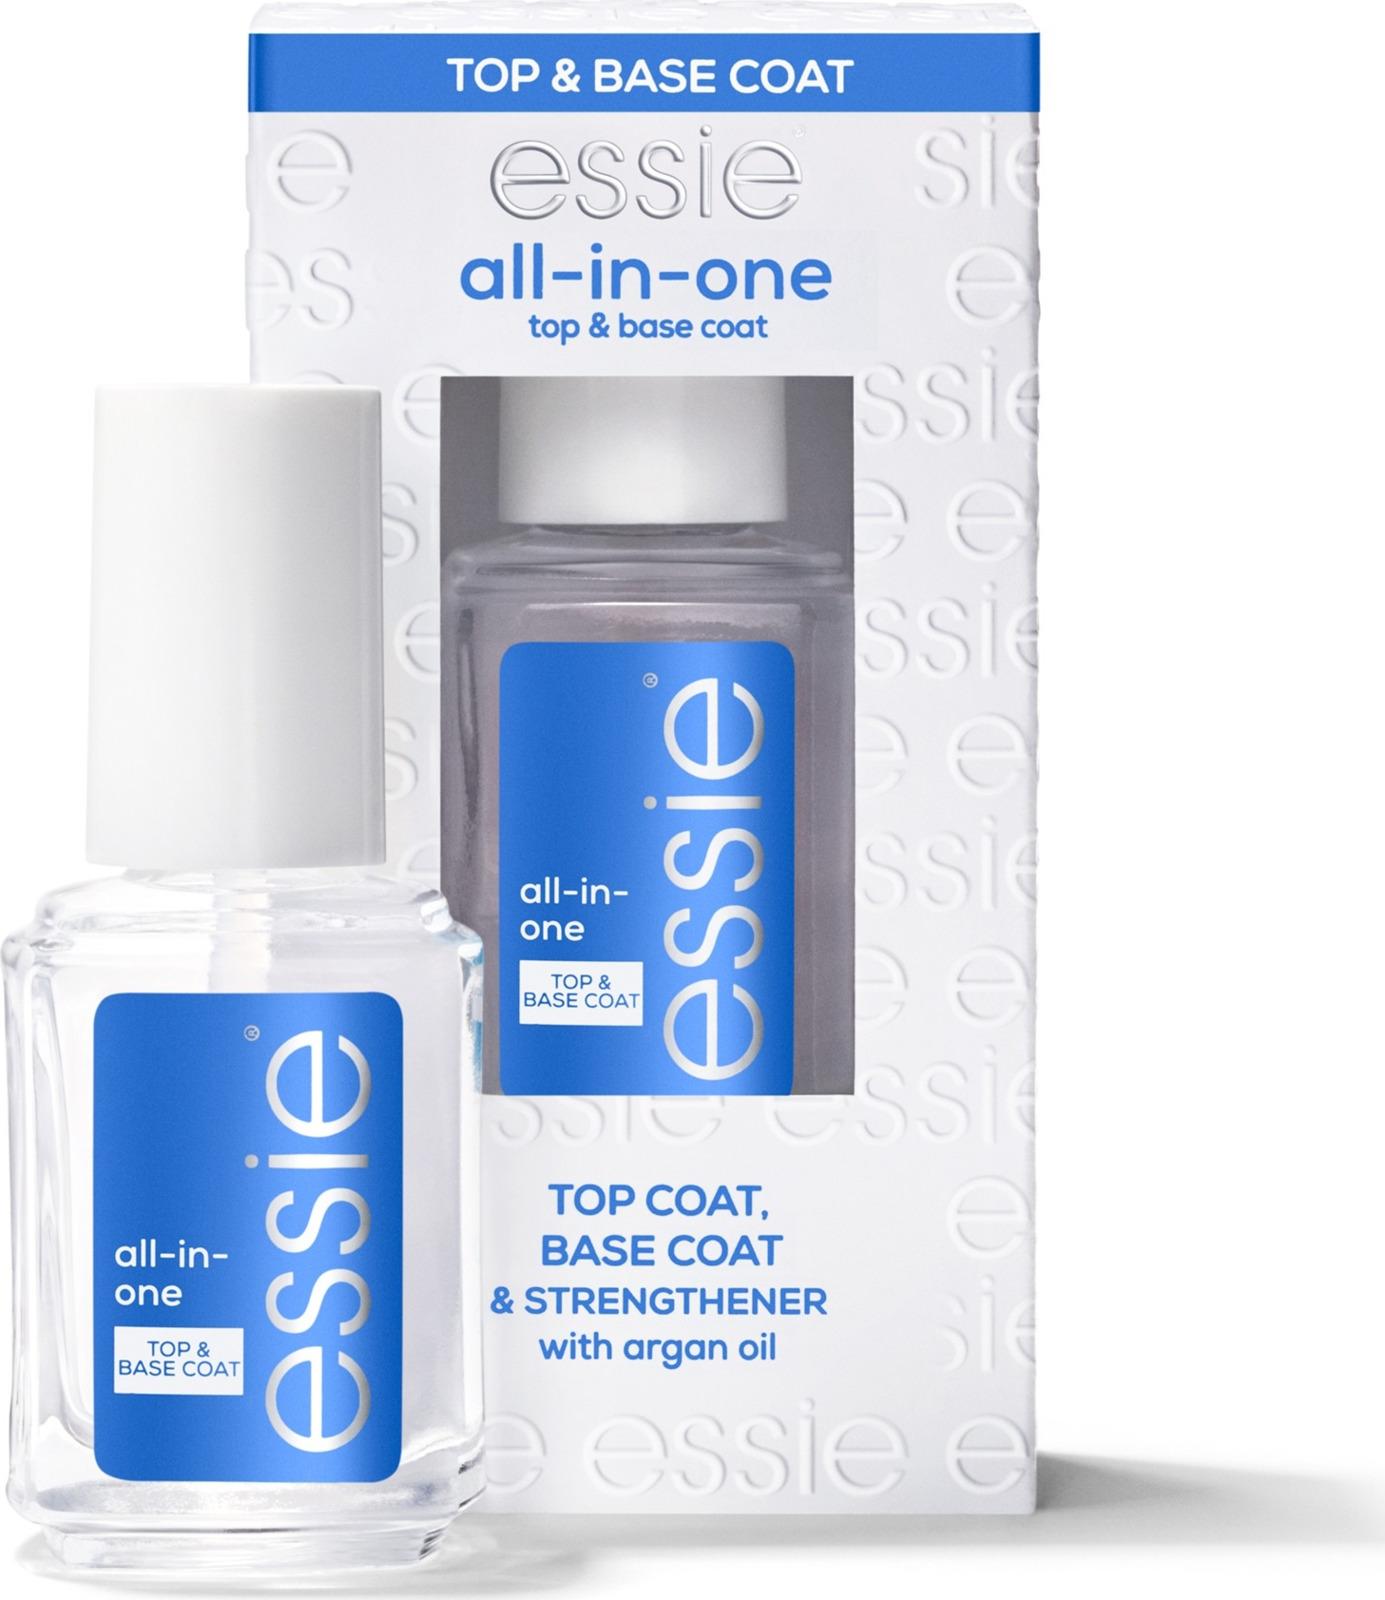 Основа под лак Essie All in One Base, комплексный уход, 13,5 мл интимная косметика system jo массажный гель масло all in one massage oil cucumber огуречный